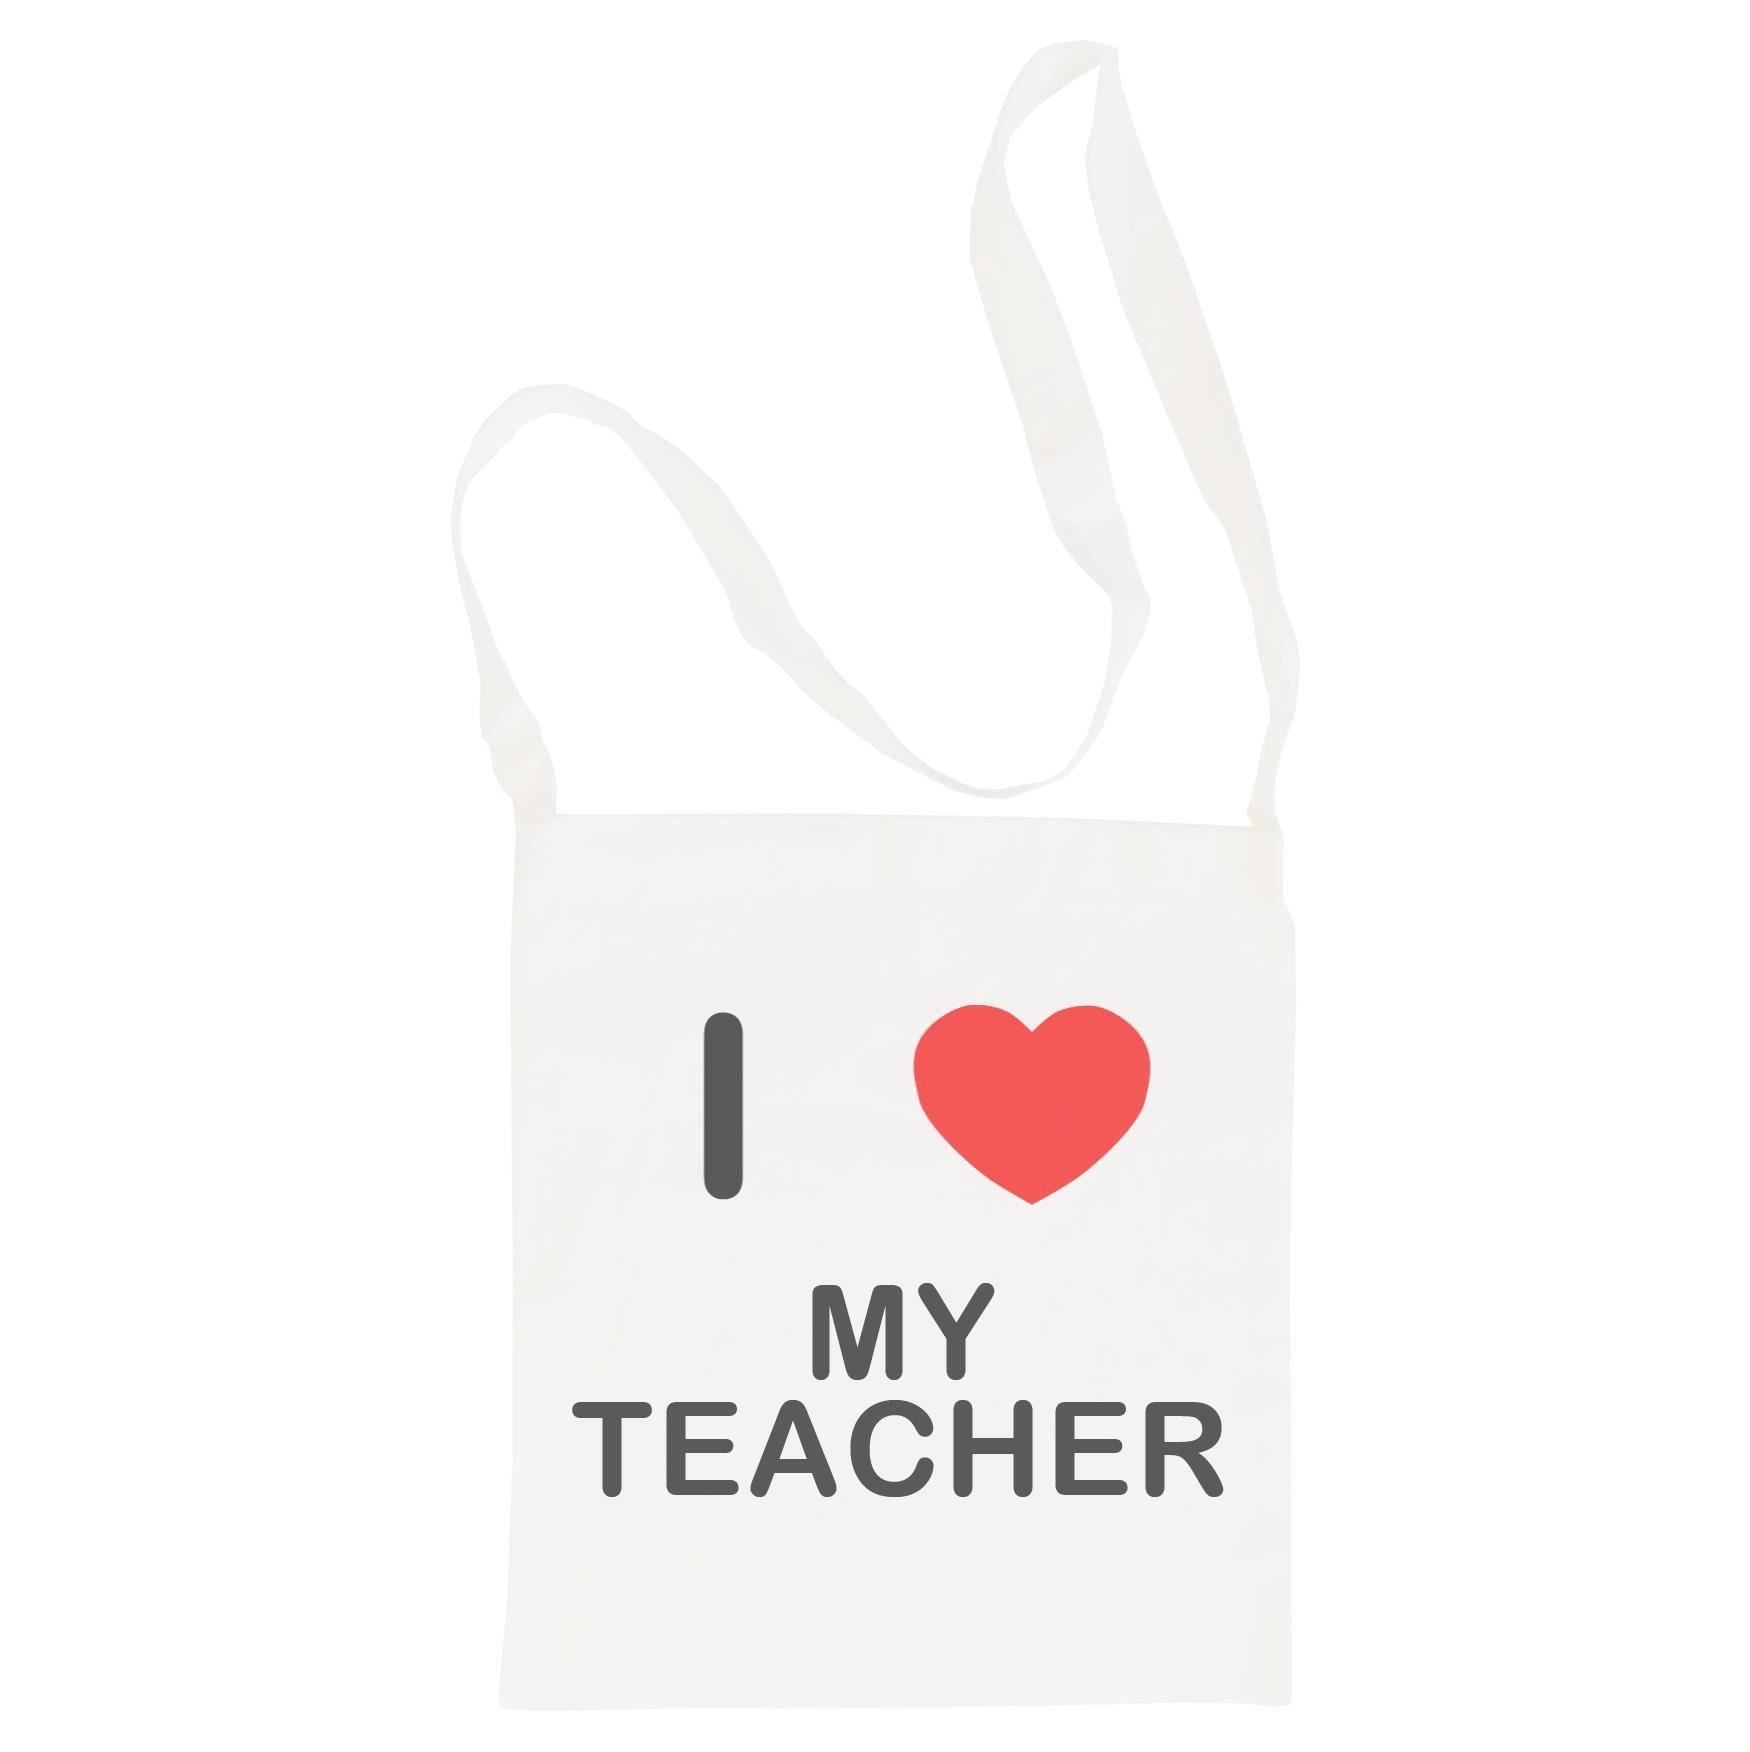 I Love My Teacher - Cotton Bag | Size choice Tote, Shopper or Sling